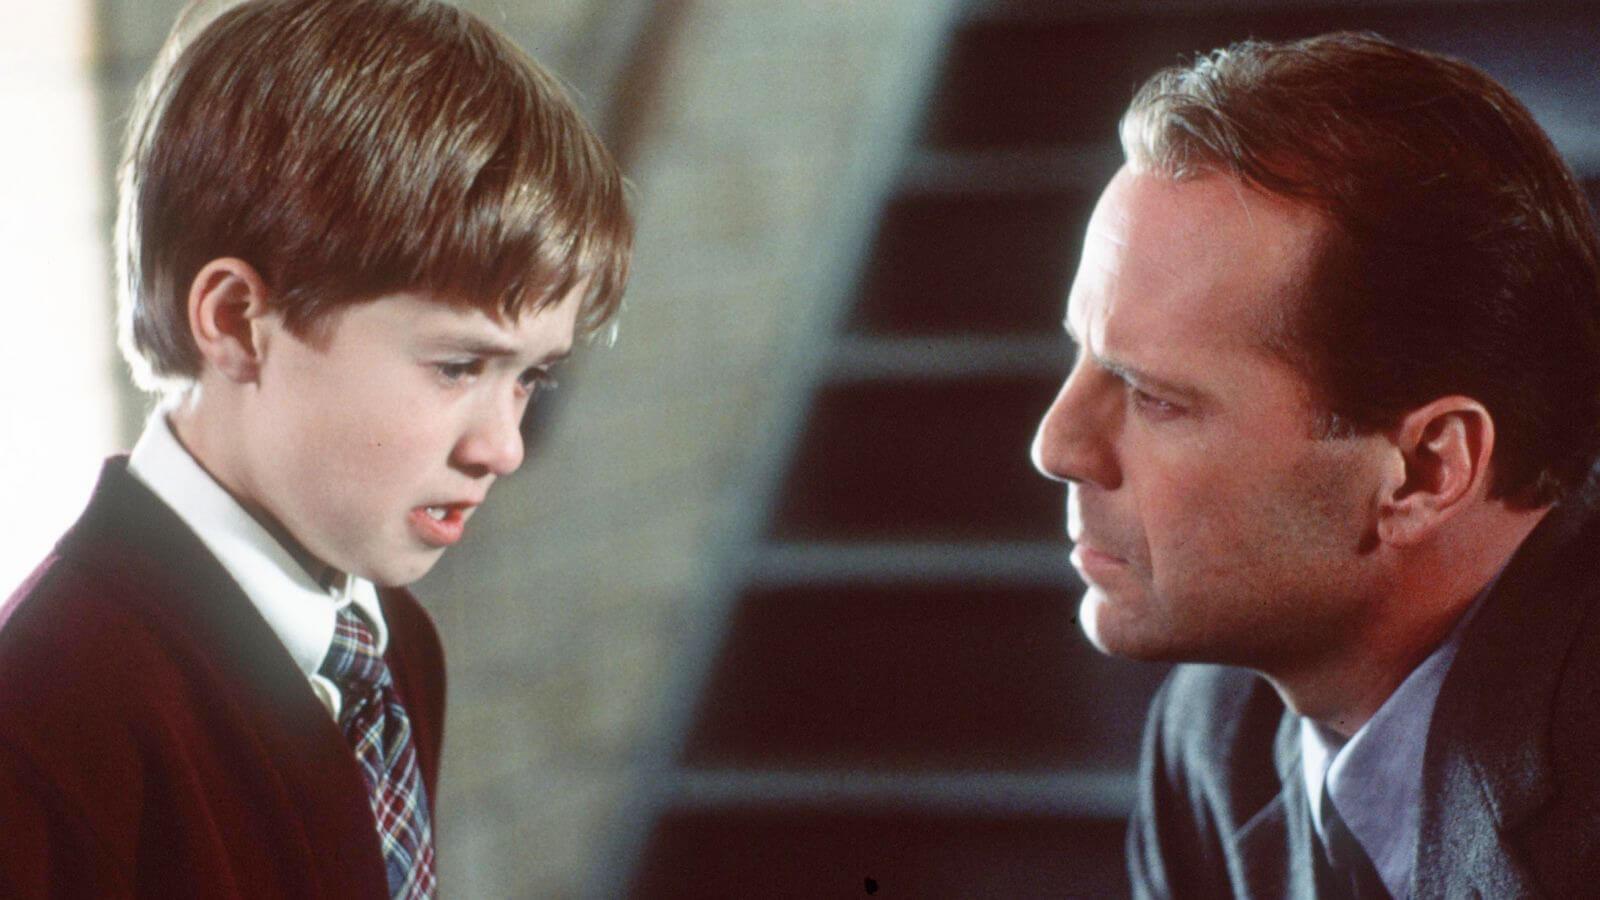 Iconic Film Twists • M Night Shyamalans The Sixth Sense